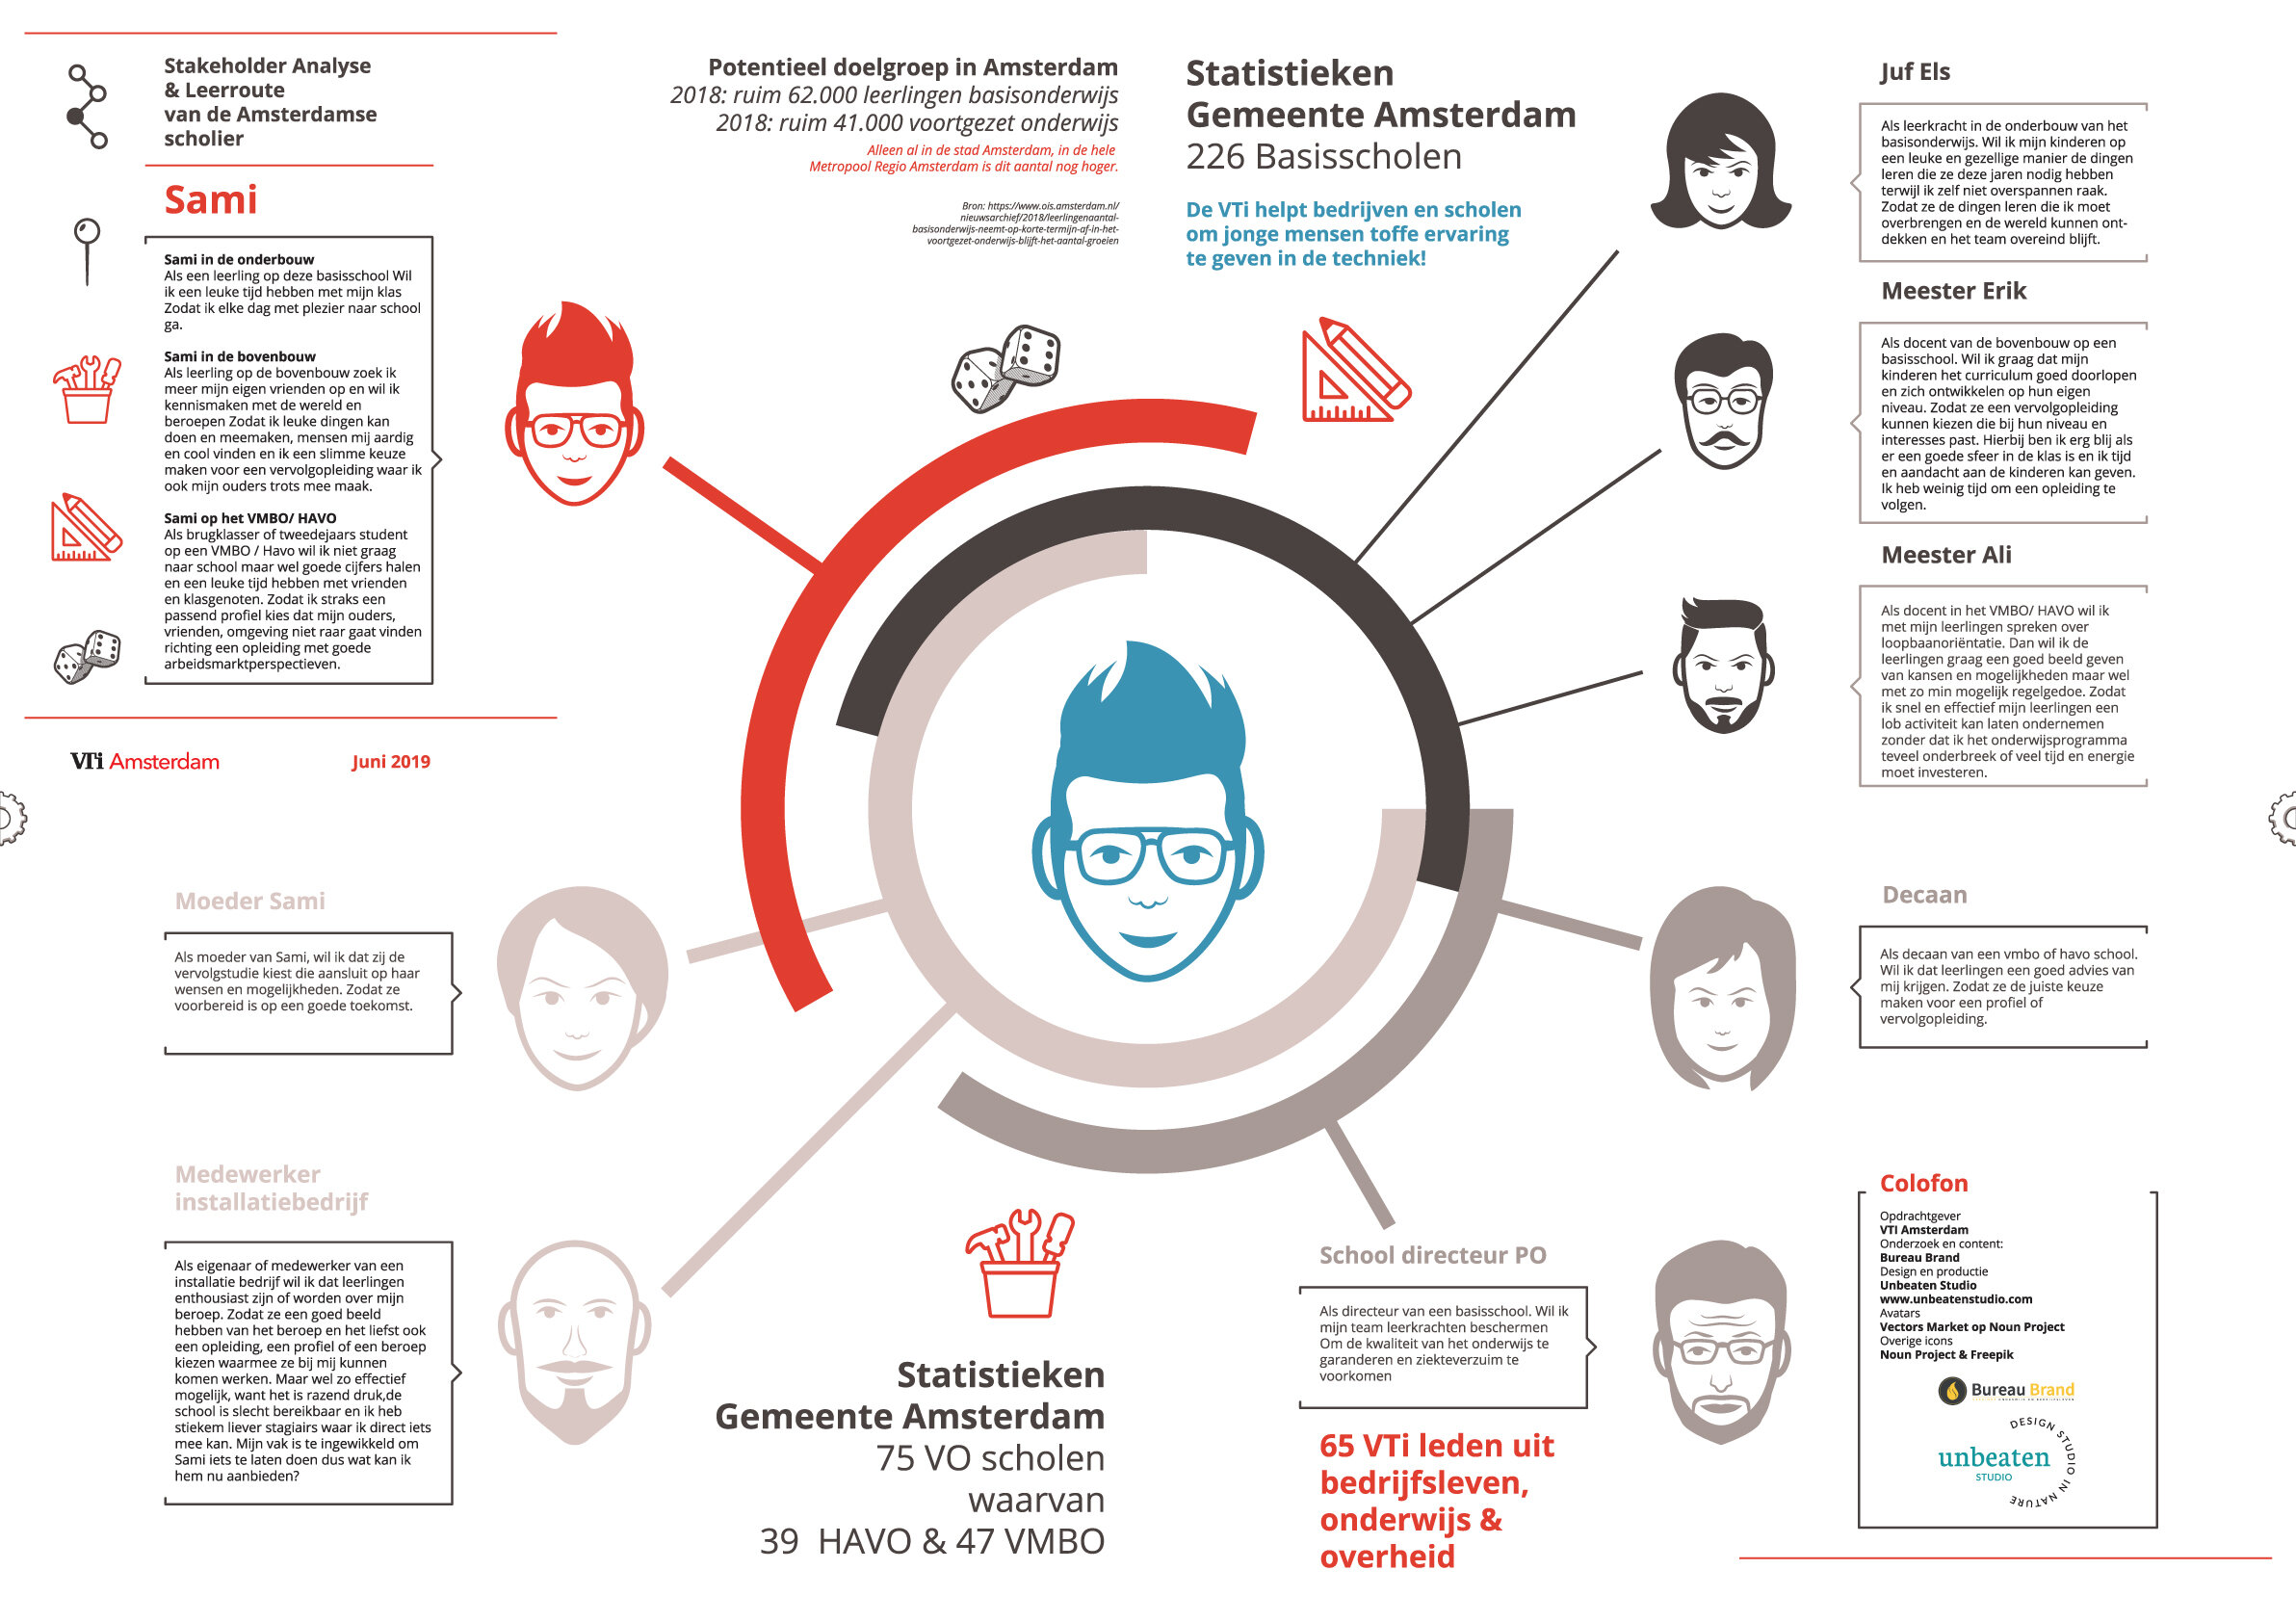 Unbeaten-studio-brand-infographic-stakeholder-map-sami.jpg